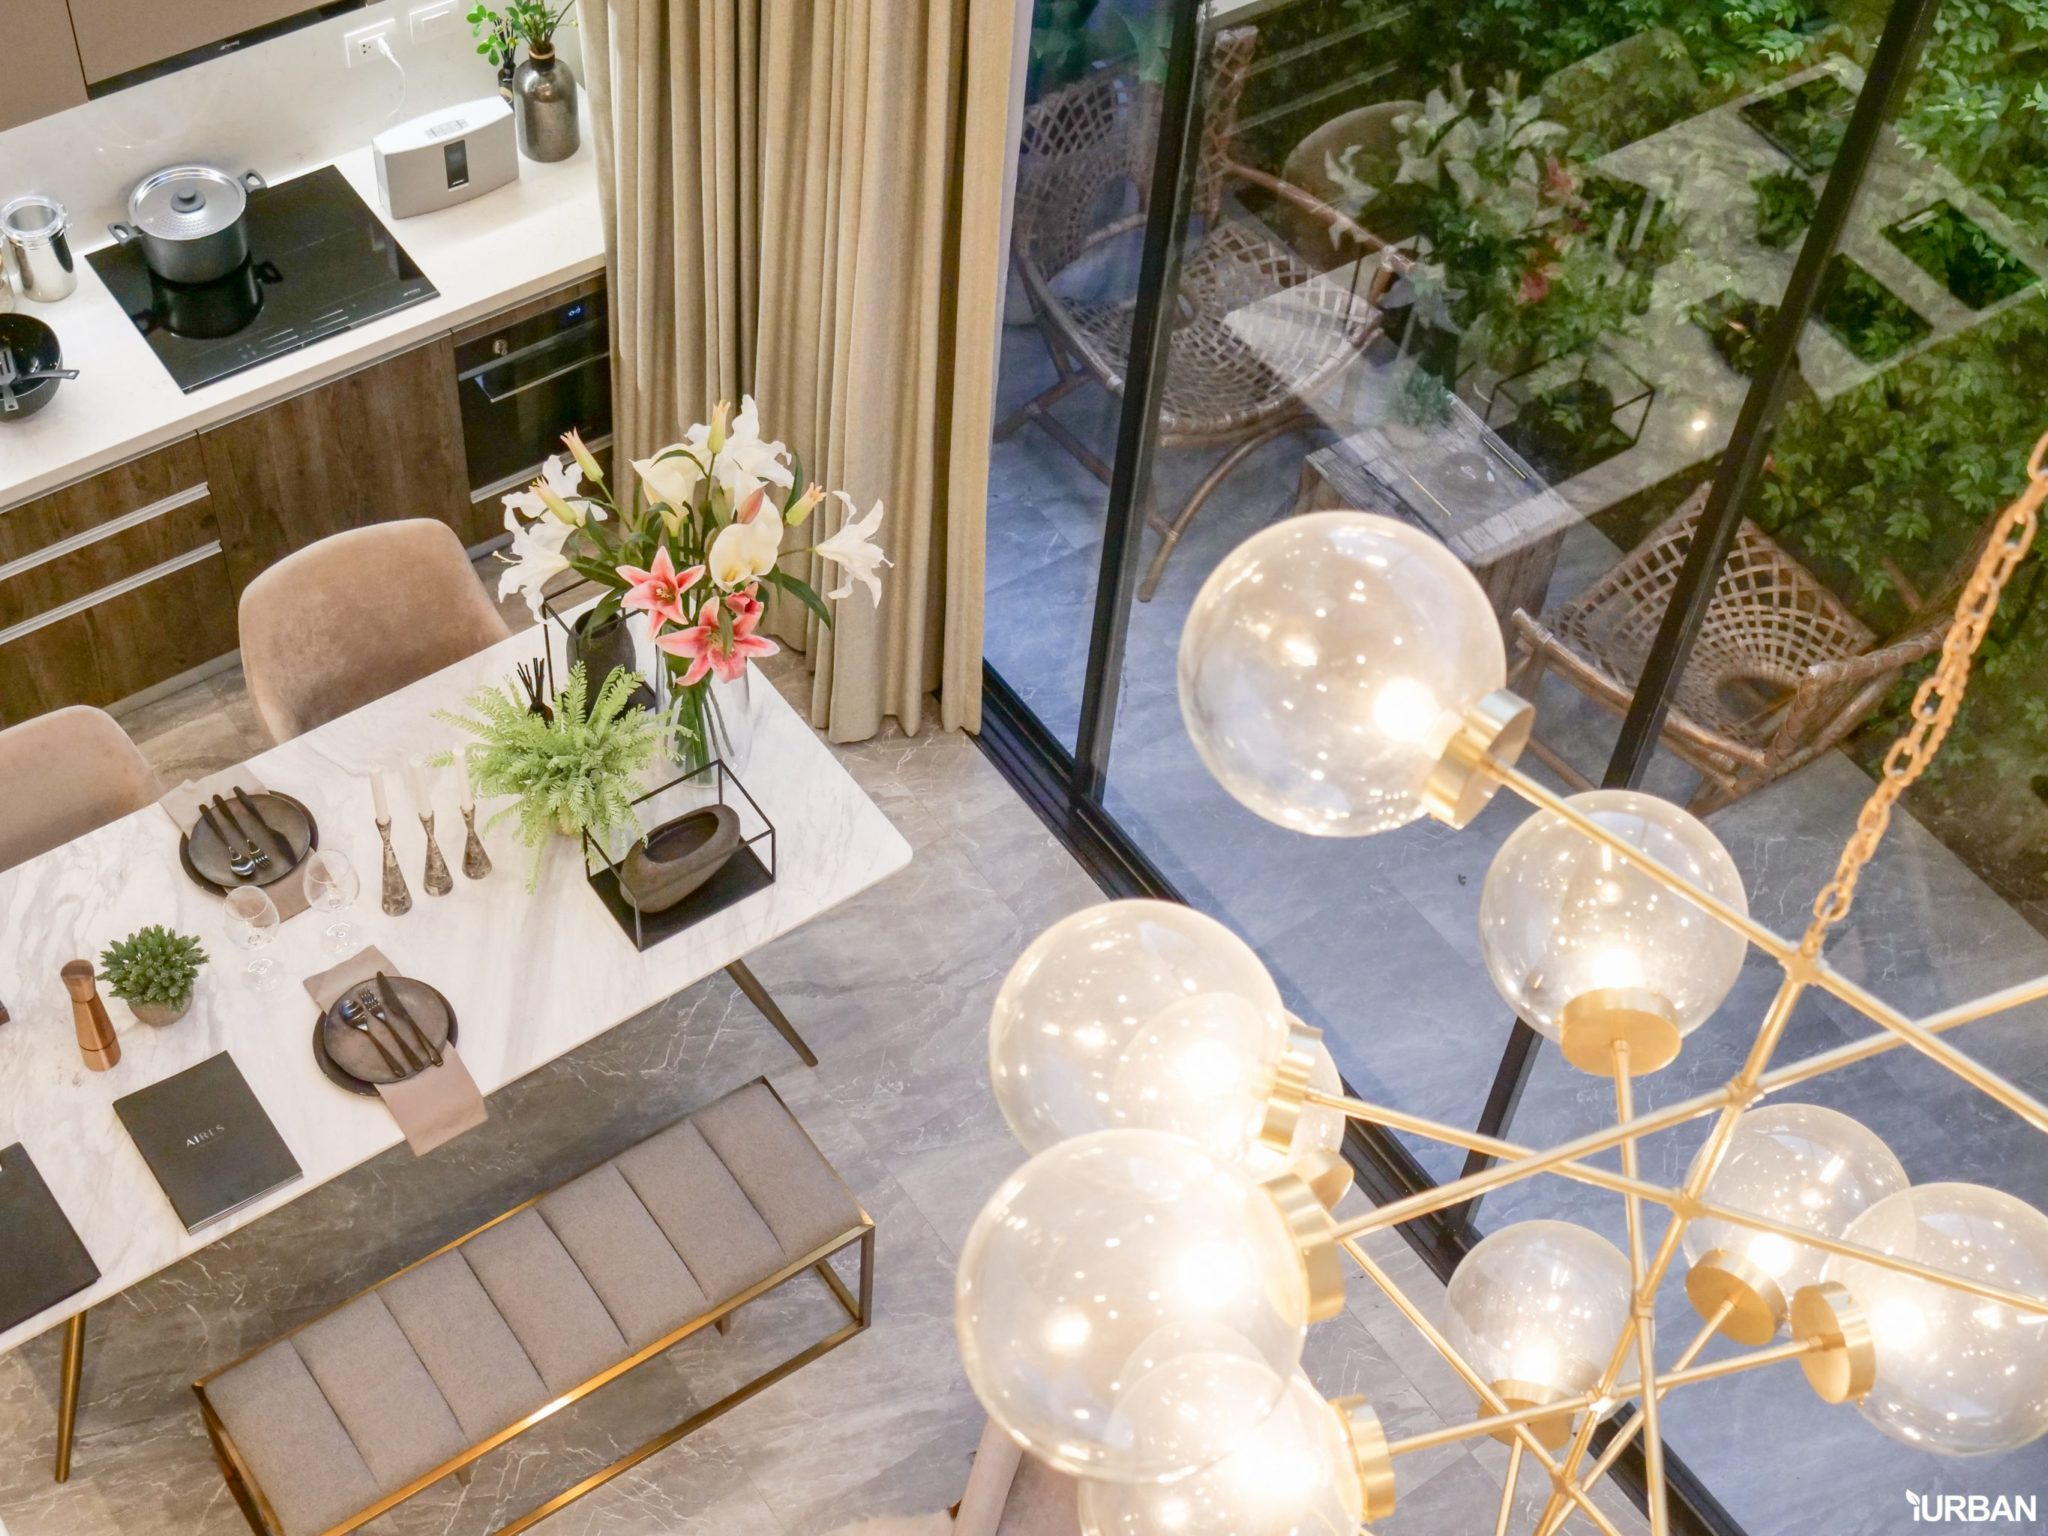 AIRES RAMA9 รีวิว Luxury Townhome 3.5 ชั้น + Rooftop ออกแบบสวย ย่านพระราม9 (ใกล้ รพ.สมิติเวช) 48 - AIRES